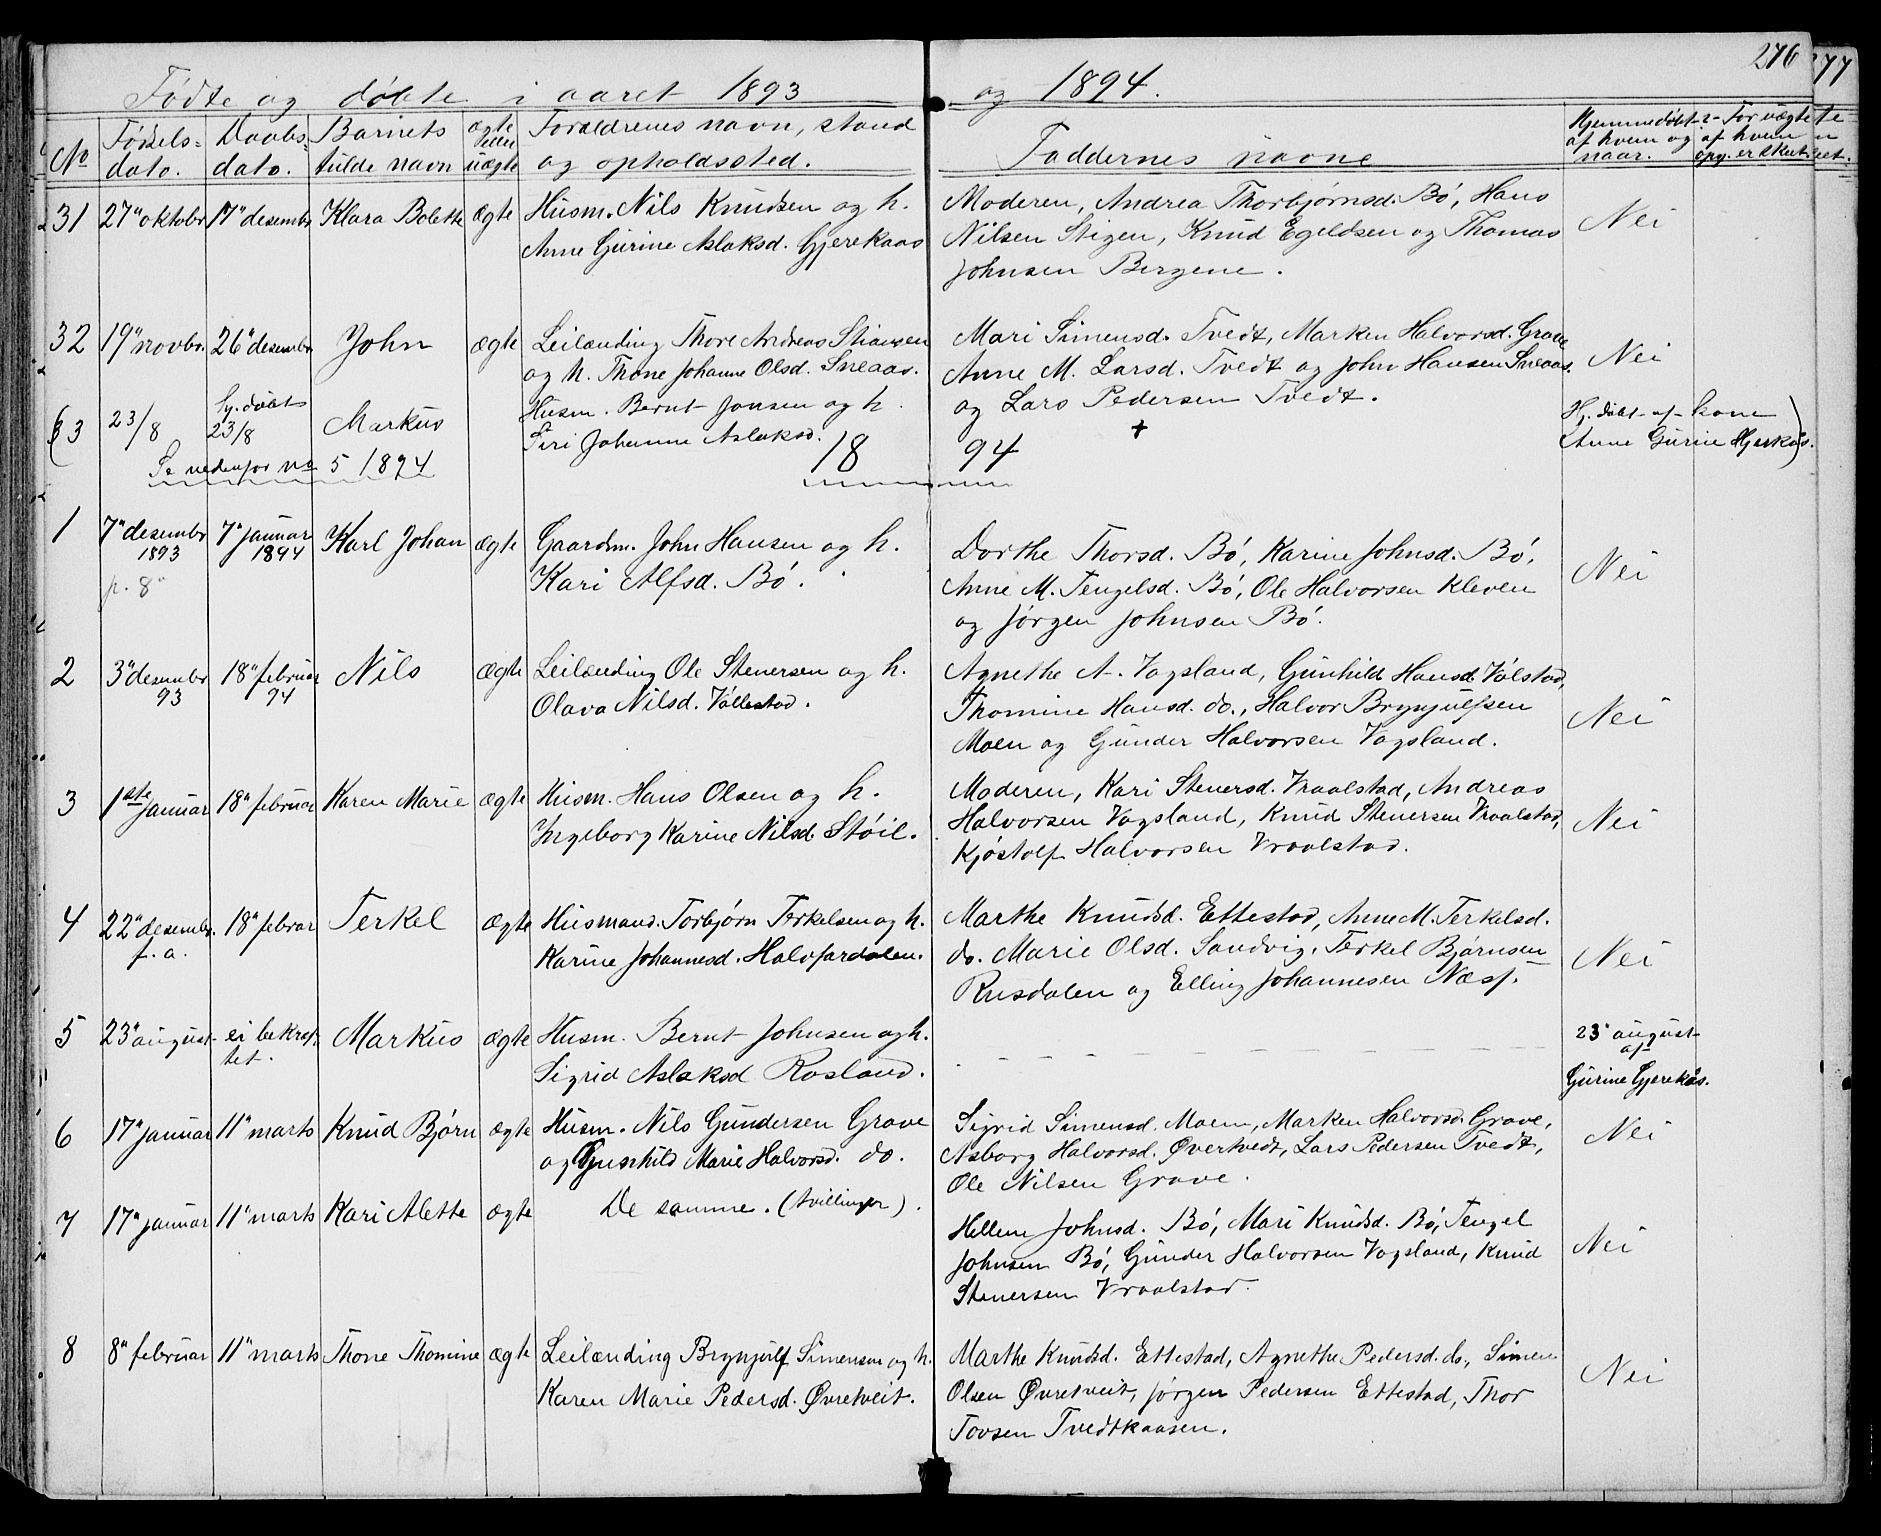 SAKO, Drangedal kirkebøker, G/Gb/L0001: Klokkerbok nr. II 1, 1856-1894, s. 276